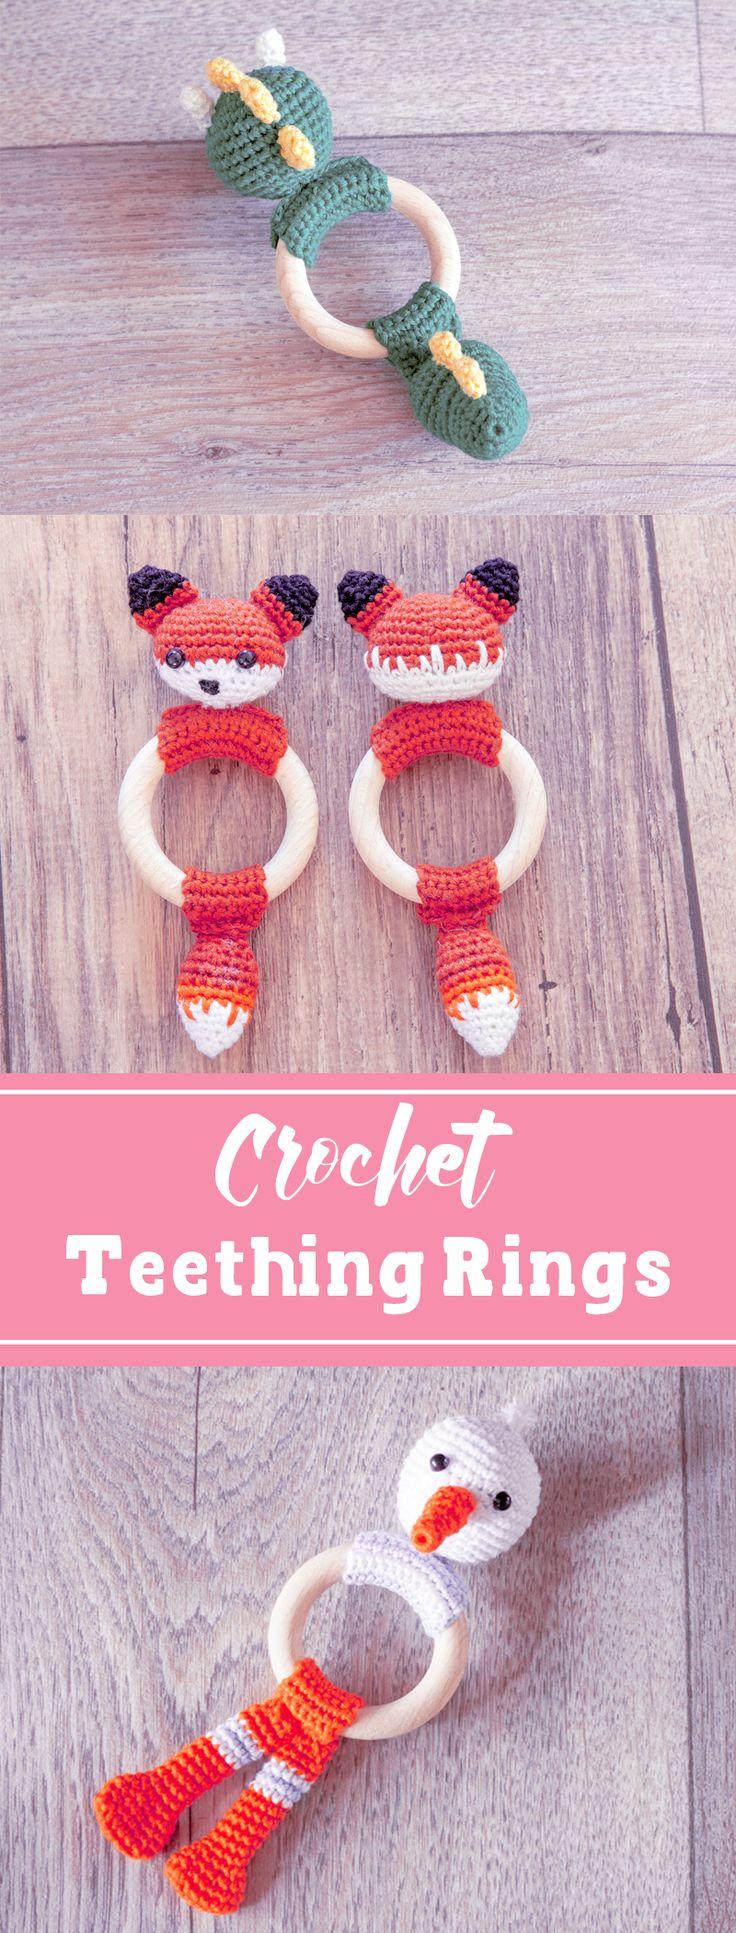 Crochet Pattern for Baby Teething Rings   Ingenious by Me